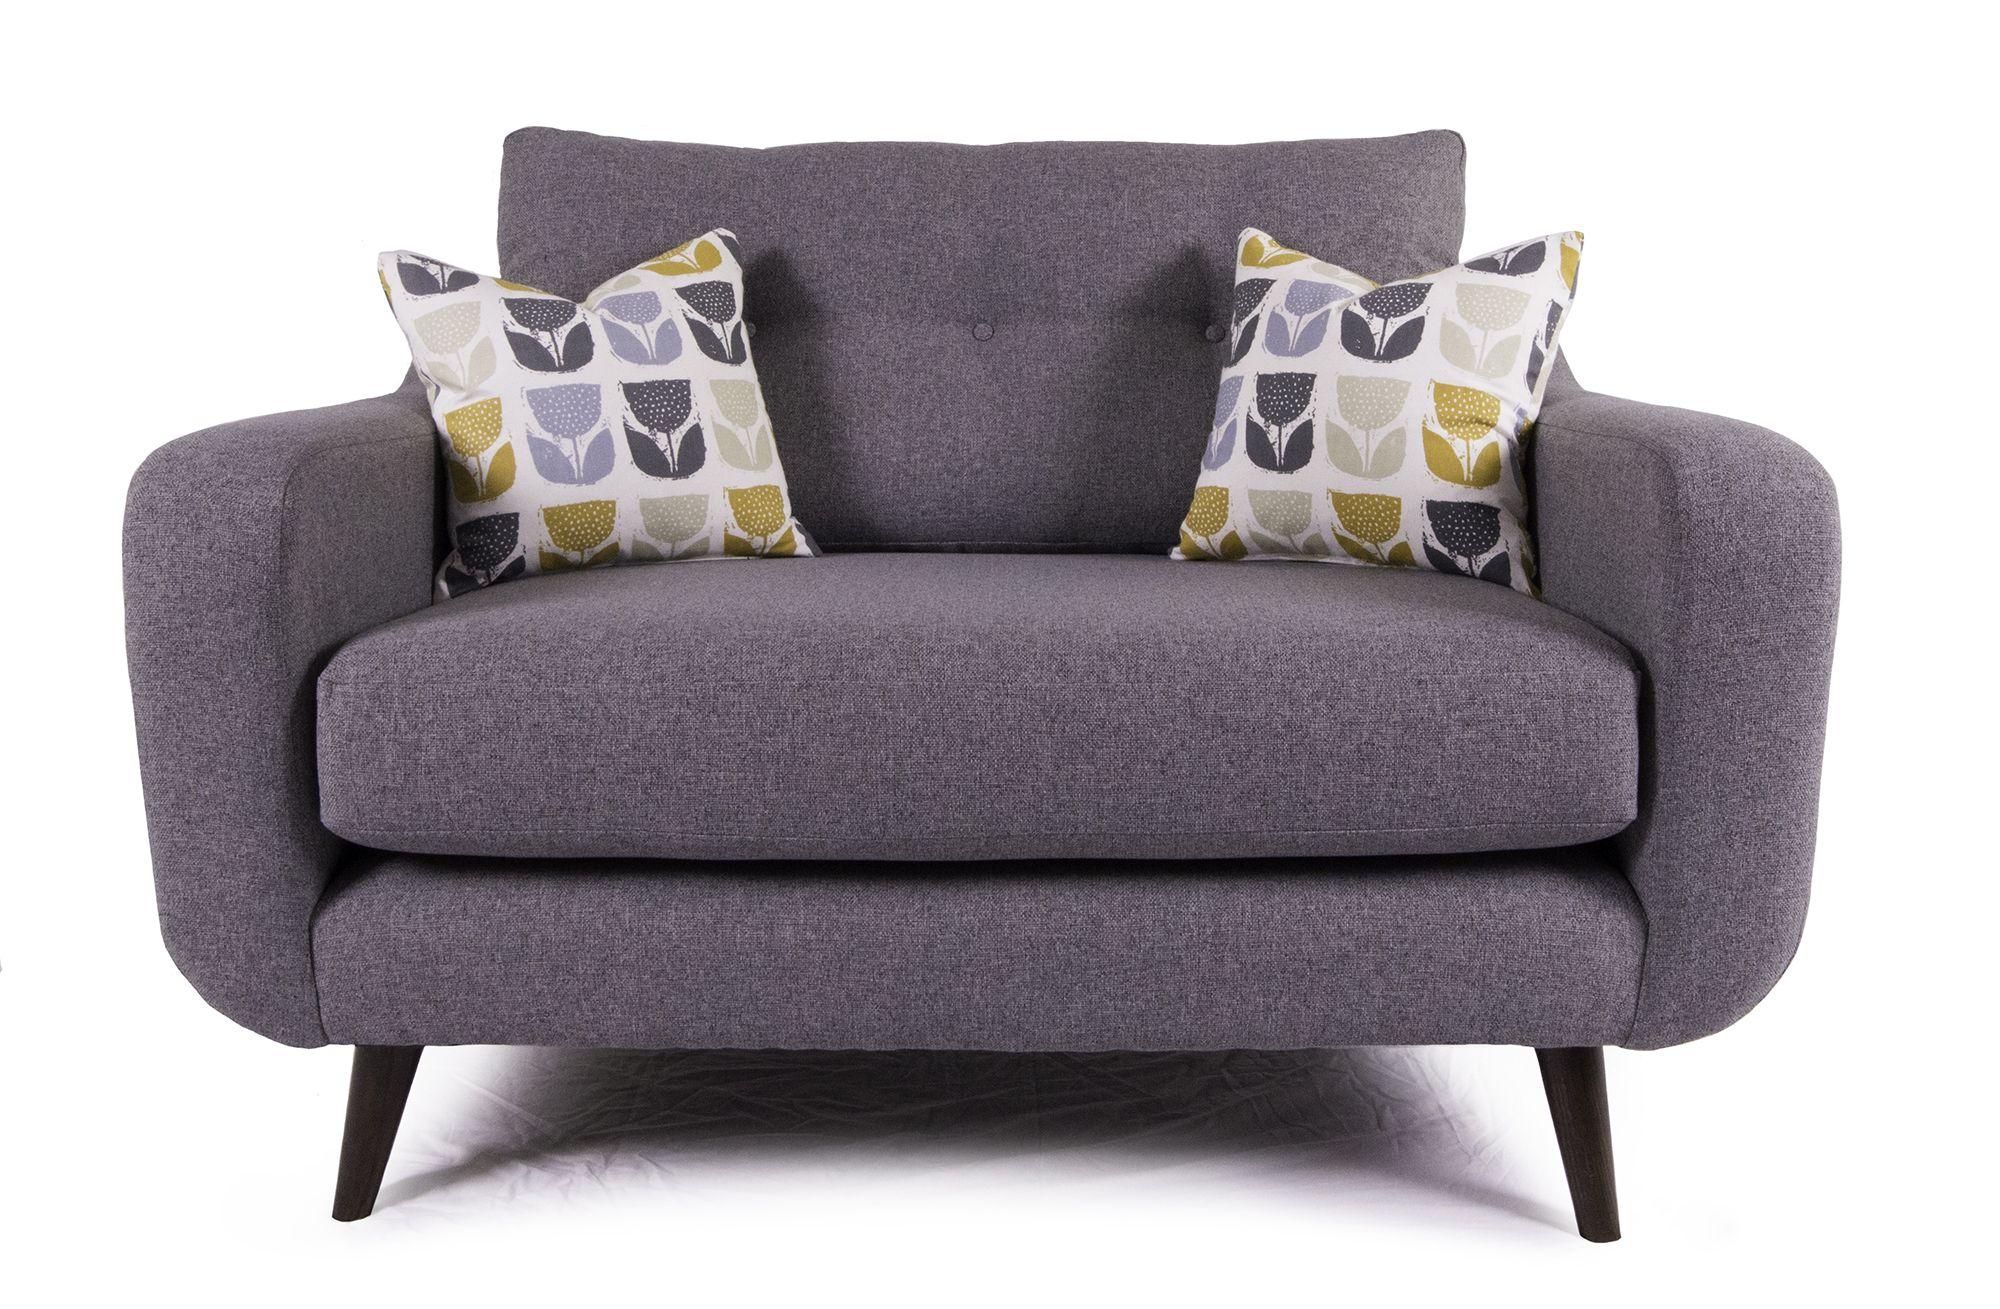 Whitemeadows Stavanger Snuggler Fabric A All Sofa Collections  # Meubles Cafe Kilkenny